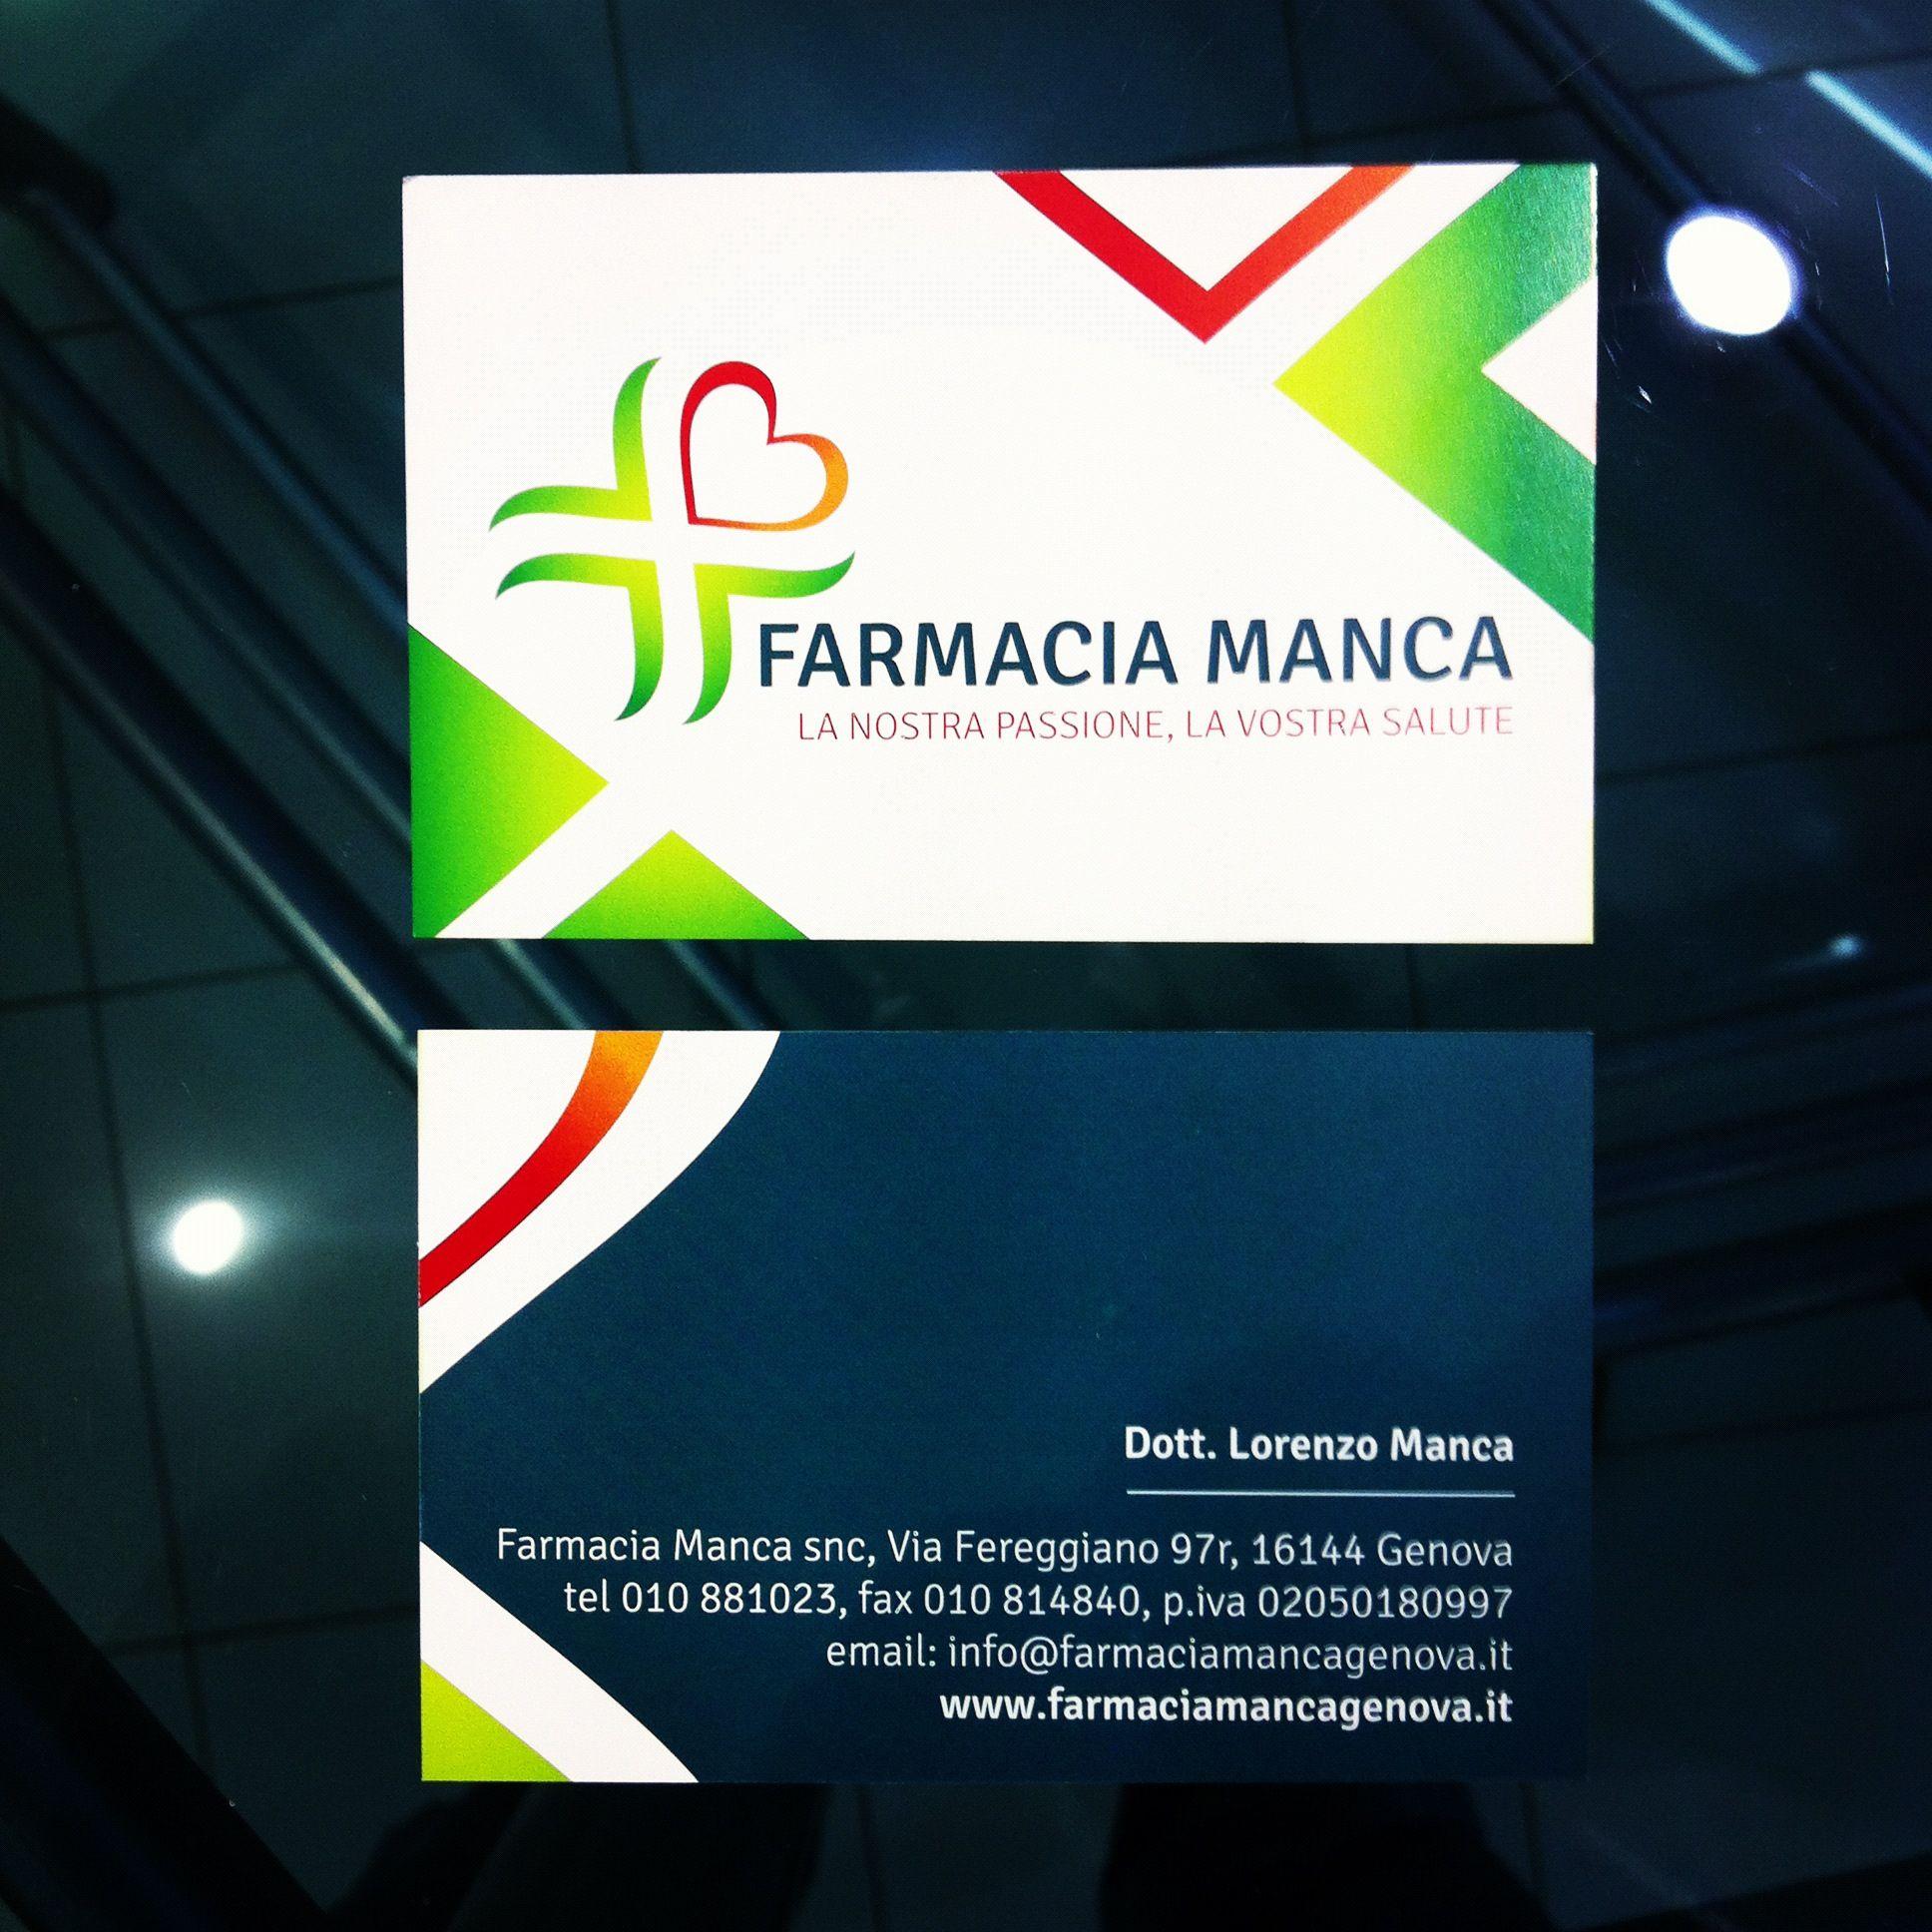 Farmacia Manca | graphic design by sbrenson